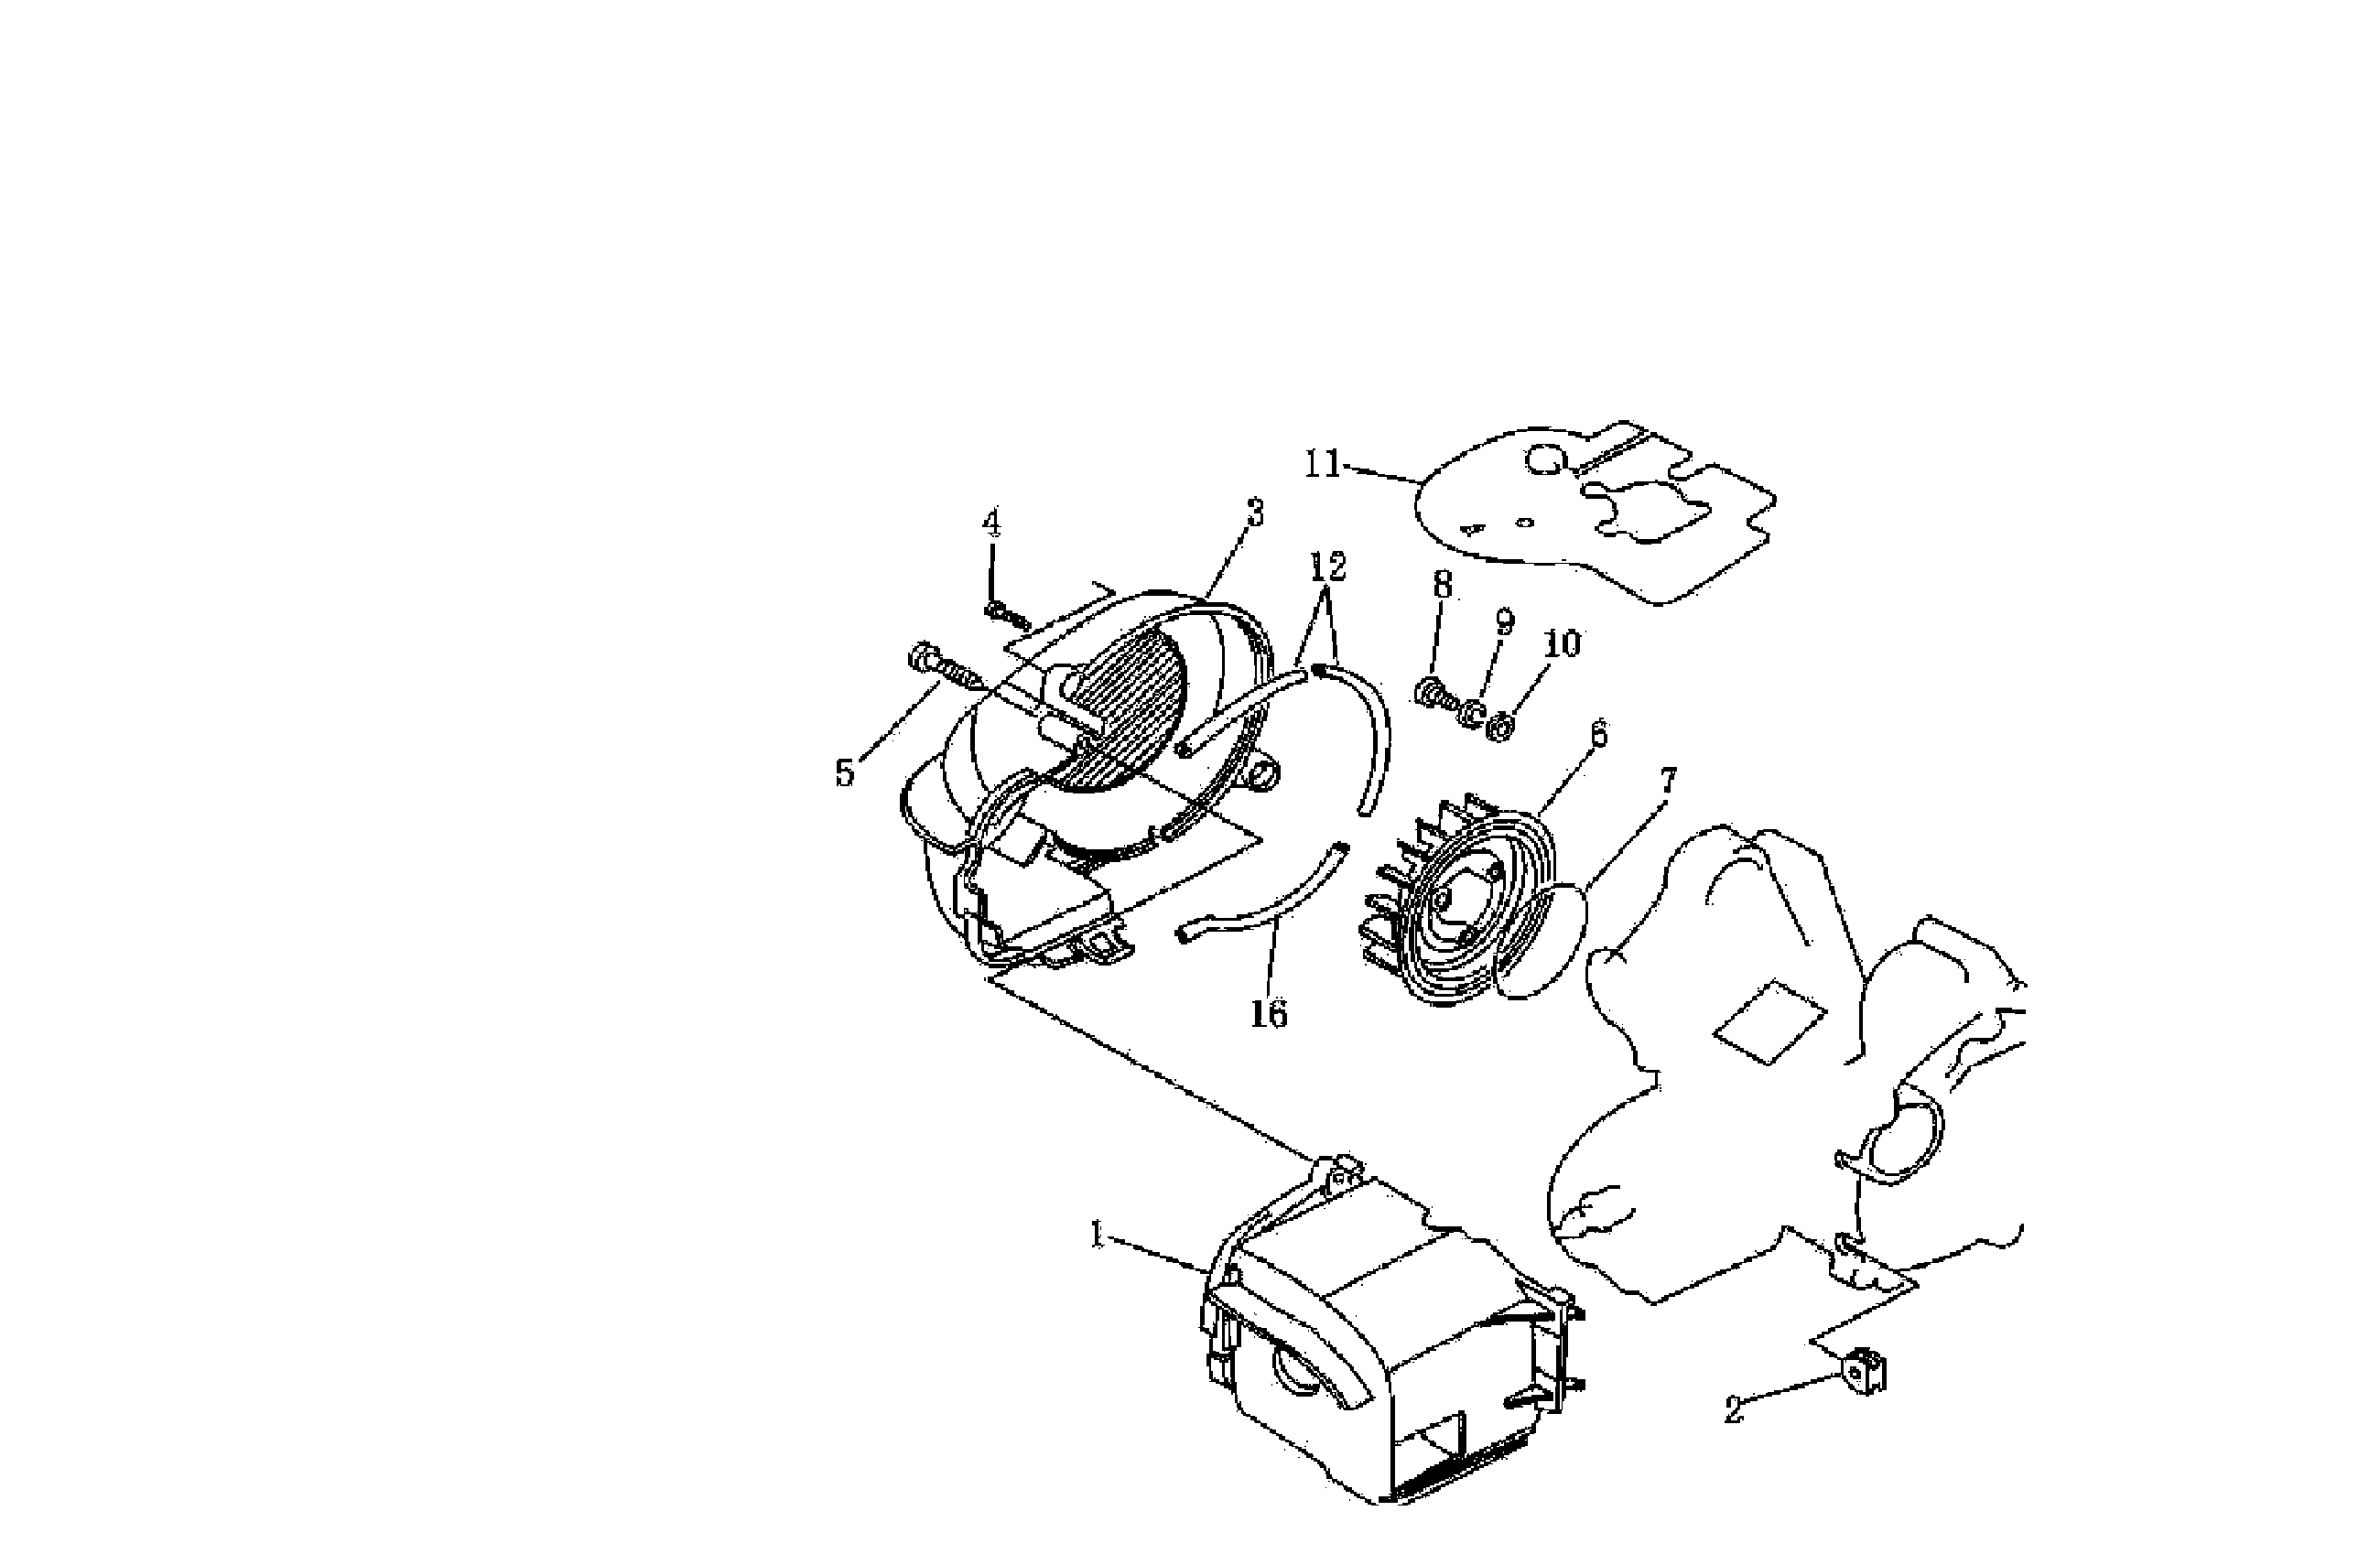 Luftkühlung